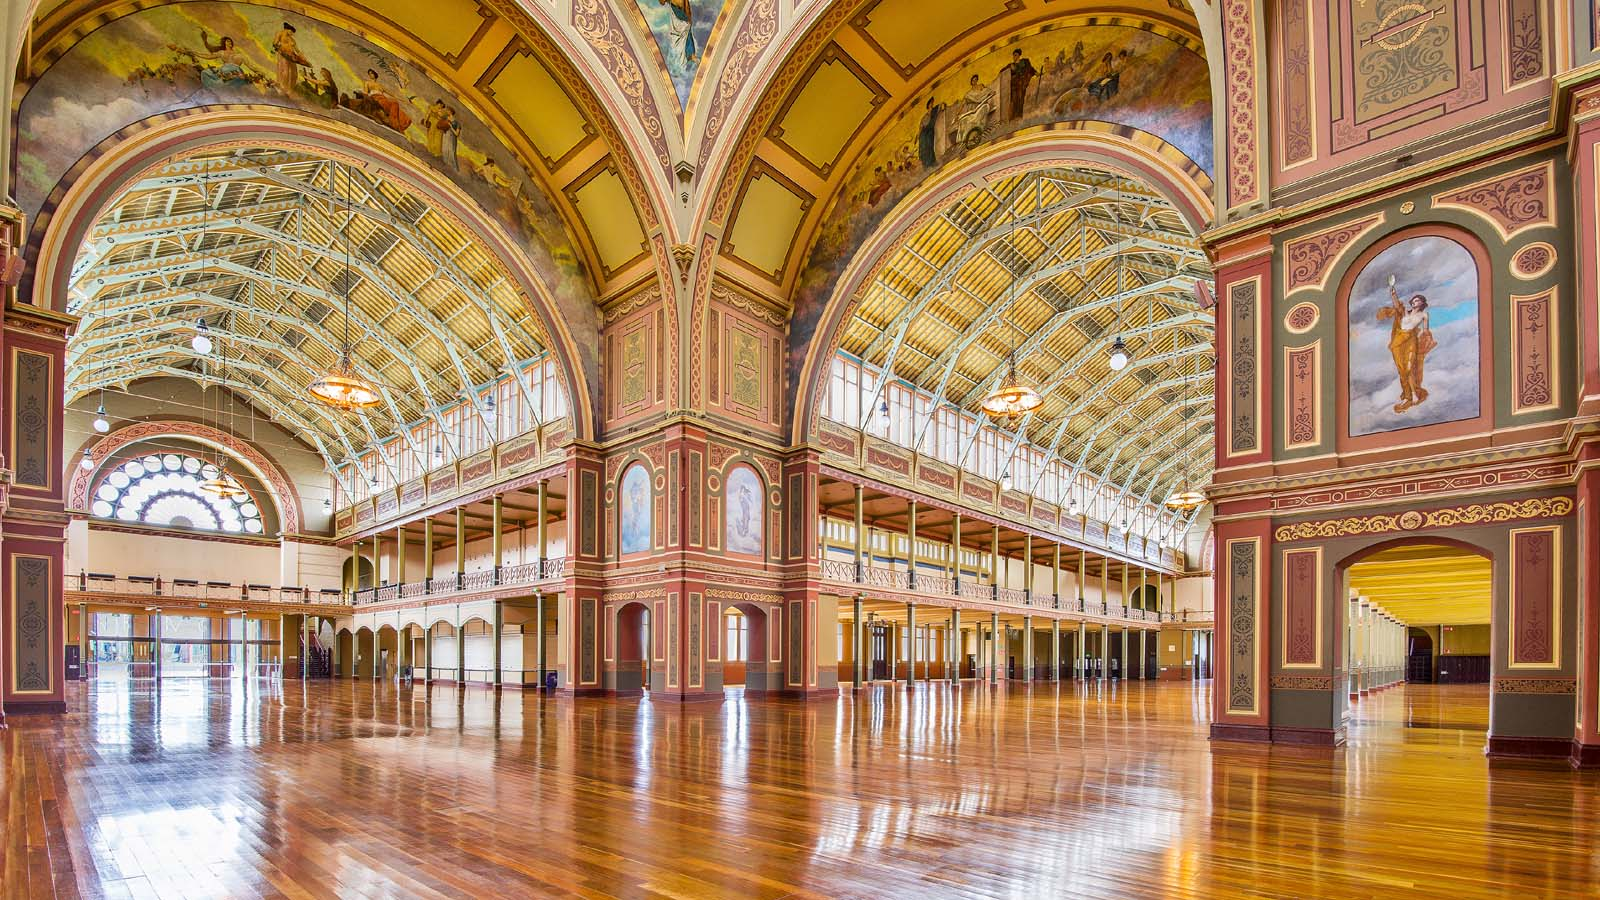 Royal Exhibition Building, Carlton, Victoria, Australia